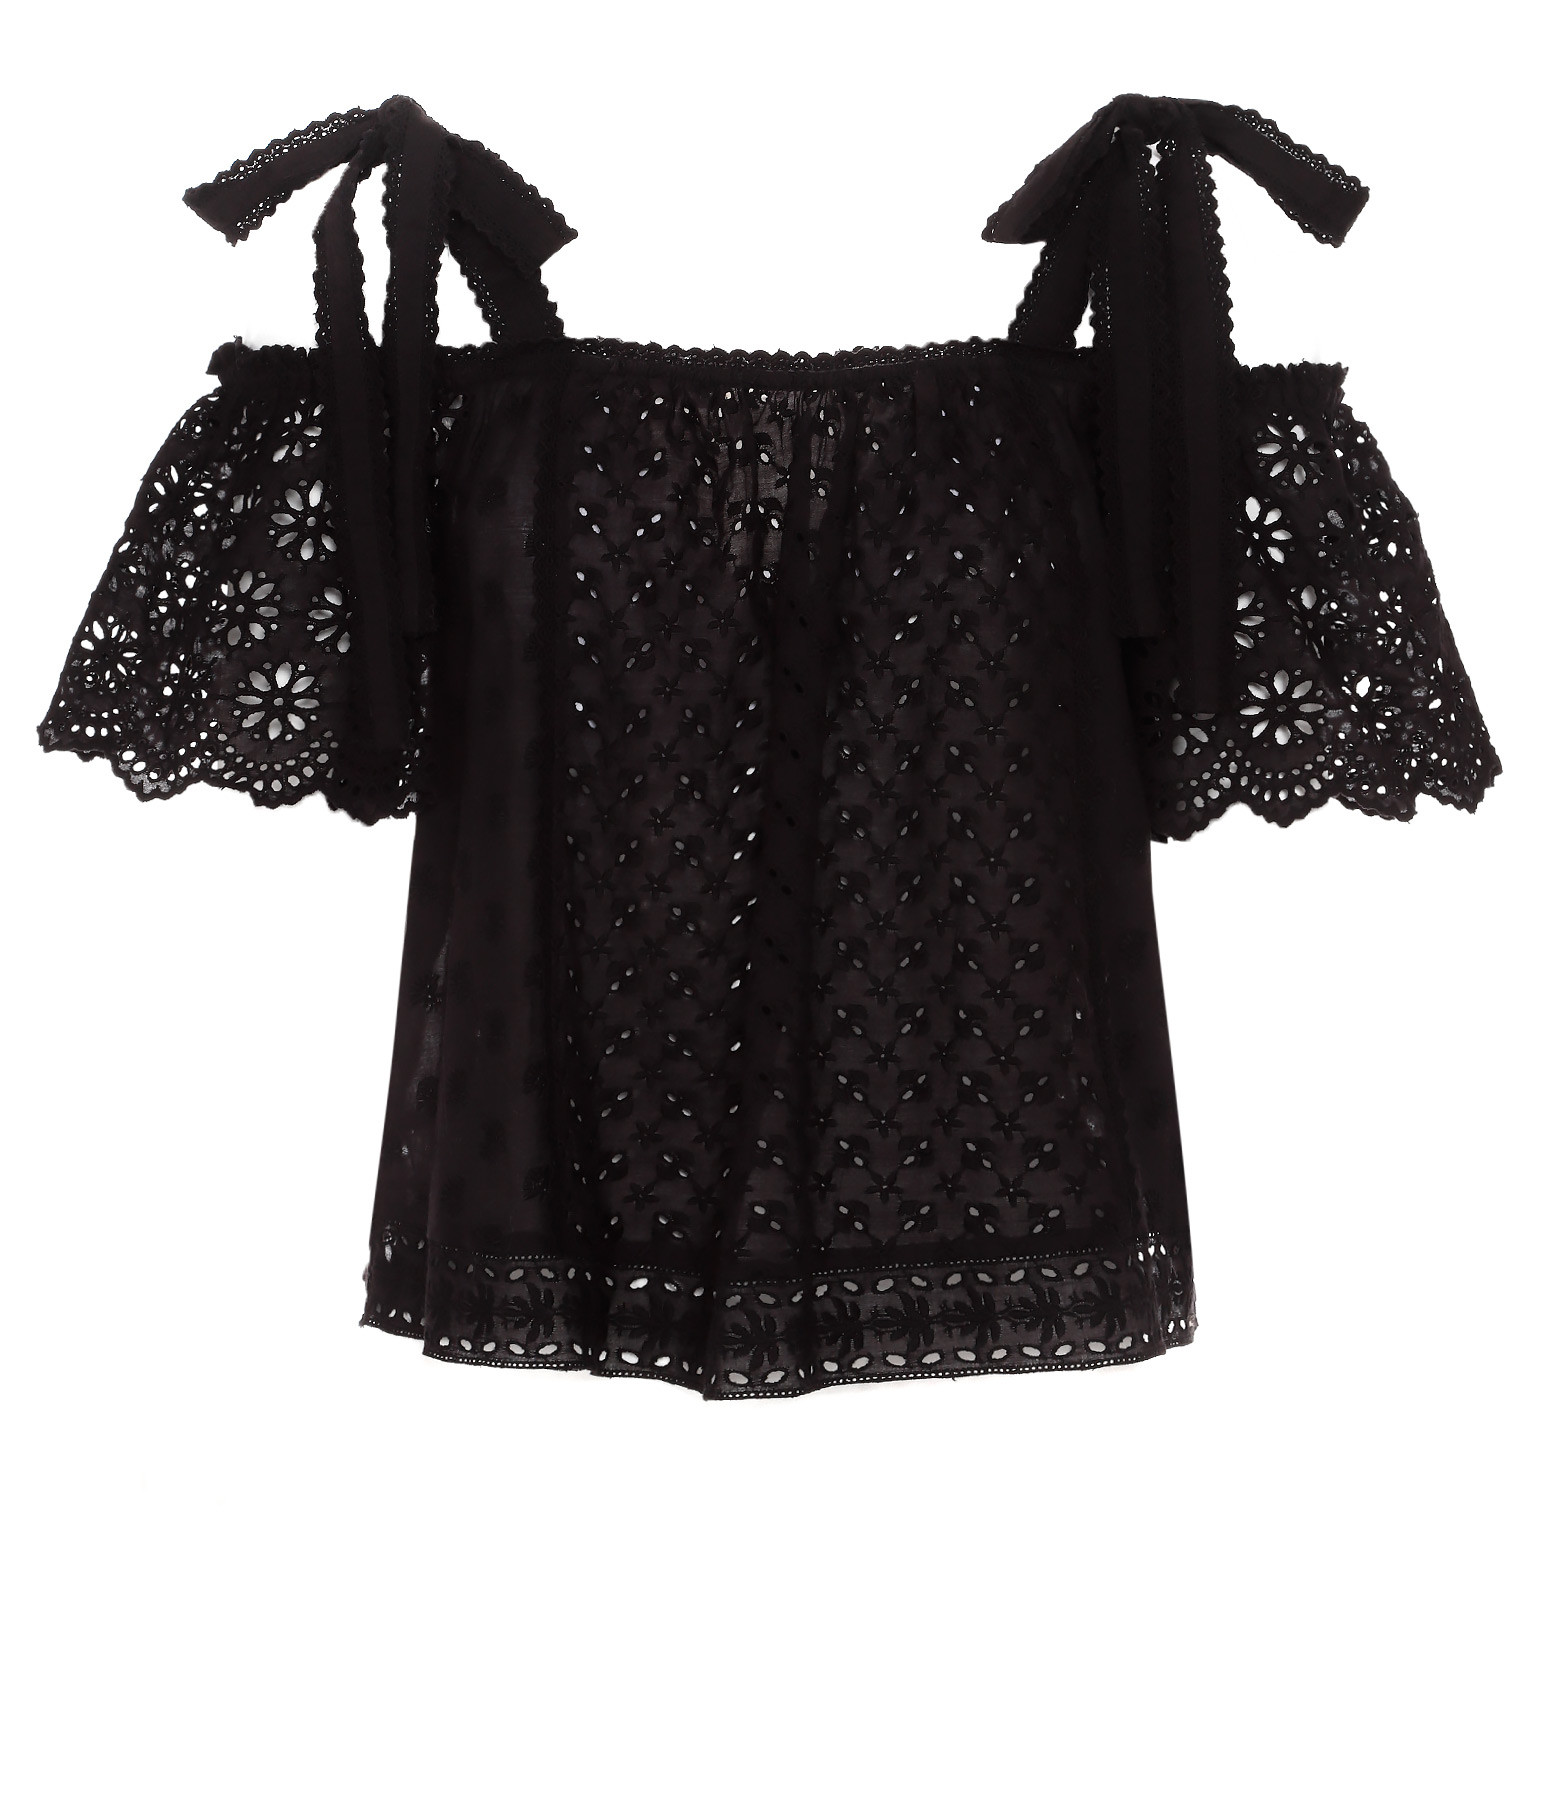 ULLA JOHNSON - Top Floral Patchwork Blythe Coton Noir